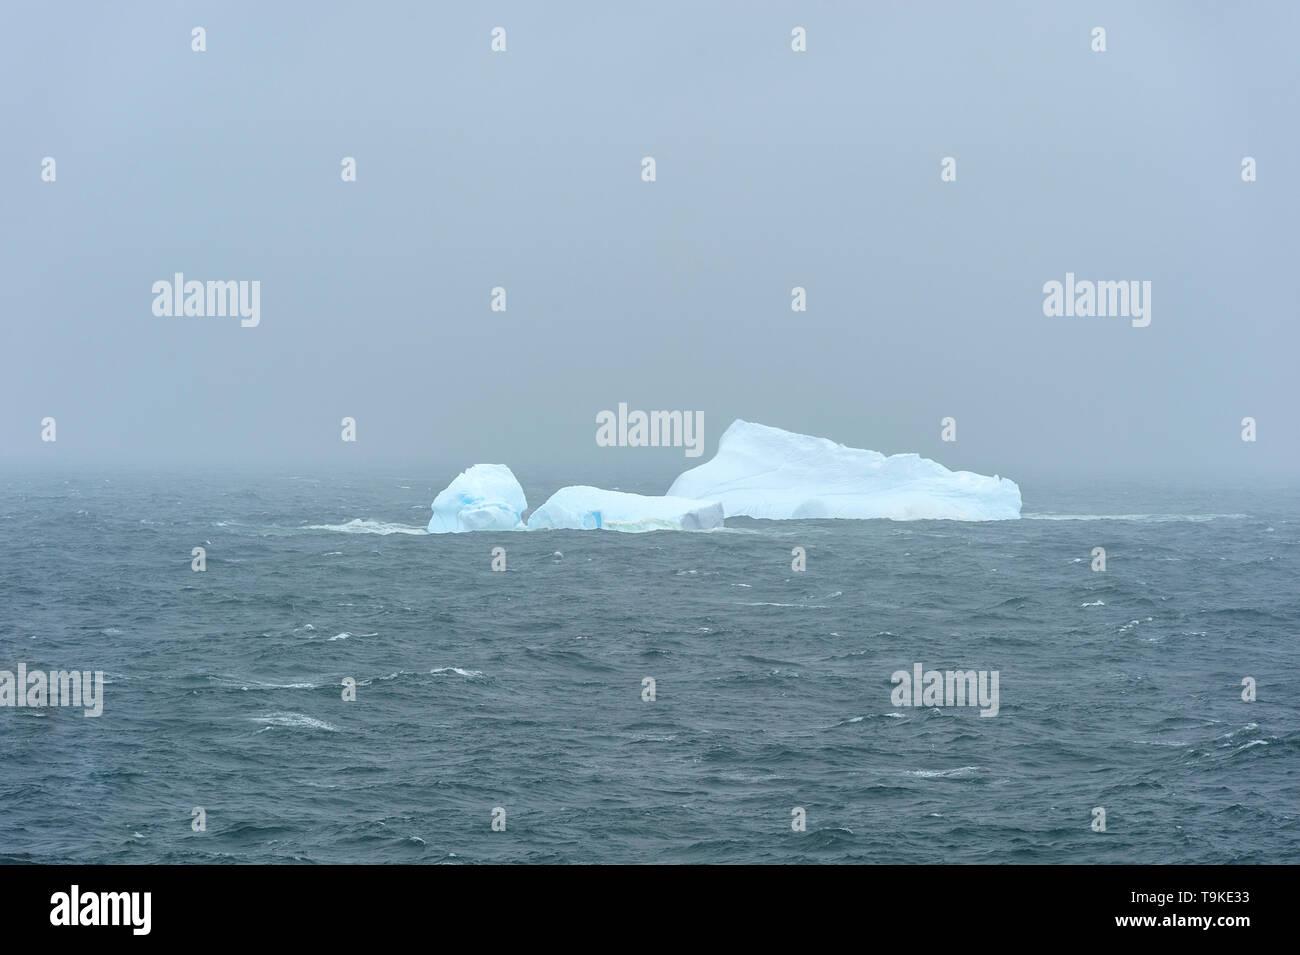 A lone iceberg in the North Atlantic - Stock Image